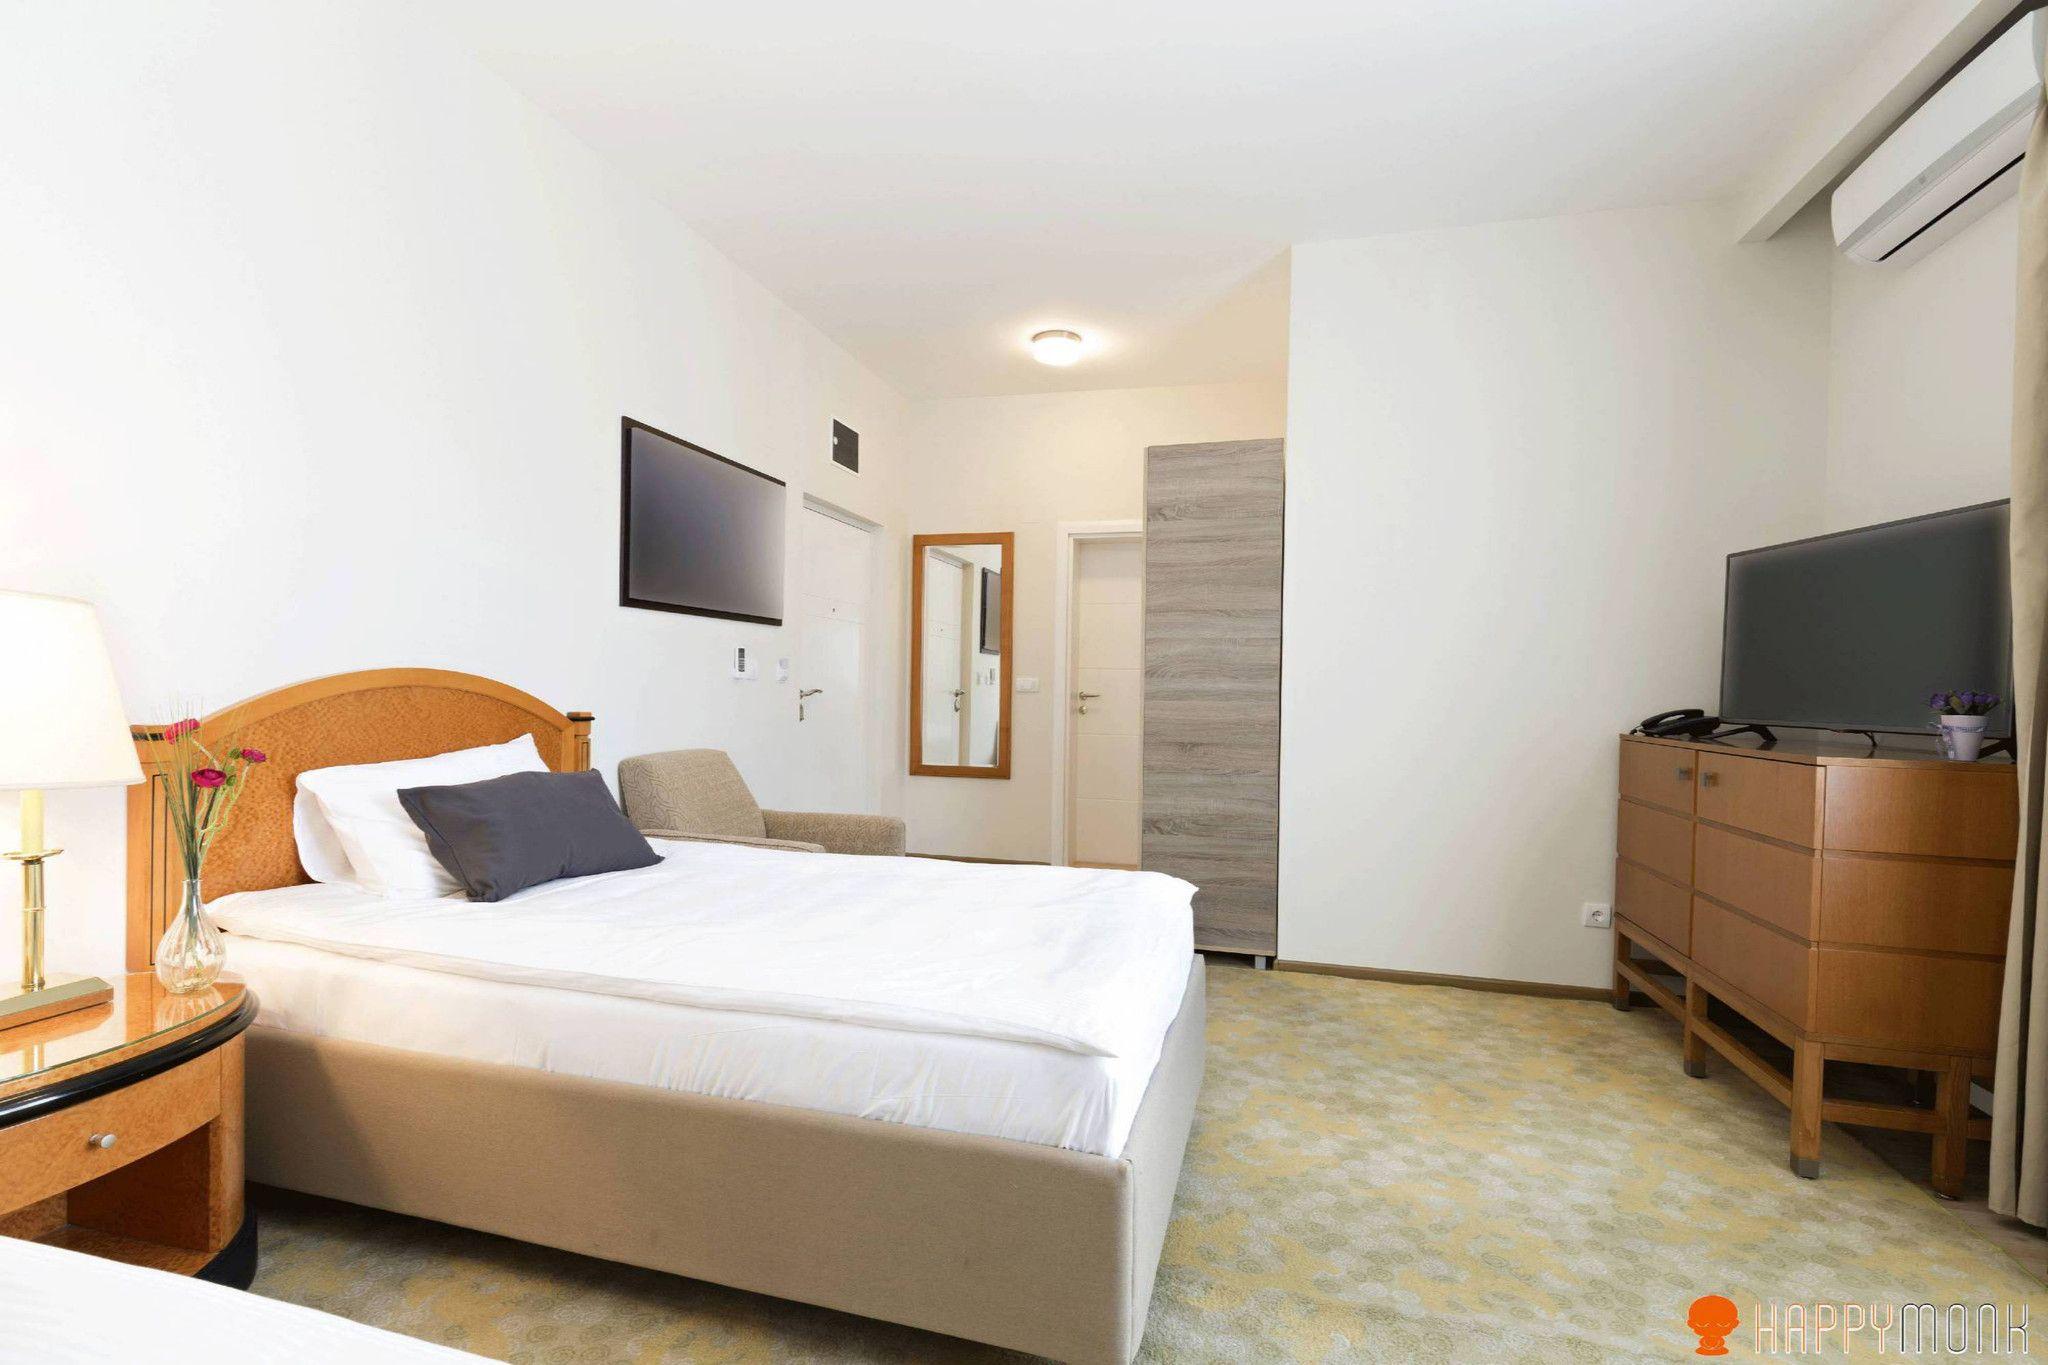 Designing A Bedroom Online Alluring Italian Interior Design For Bed Room  Happymonk  Italian Decorating Inspiration